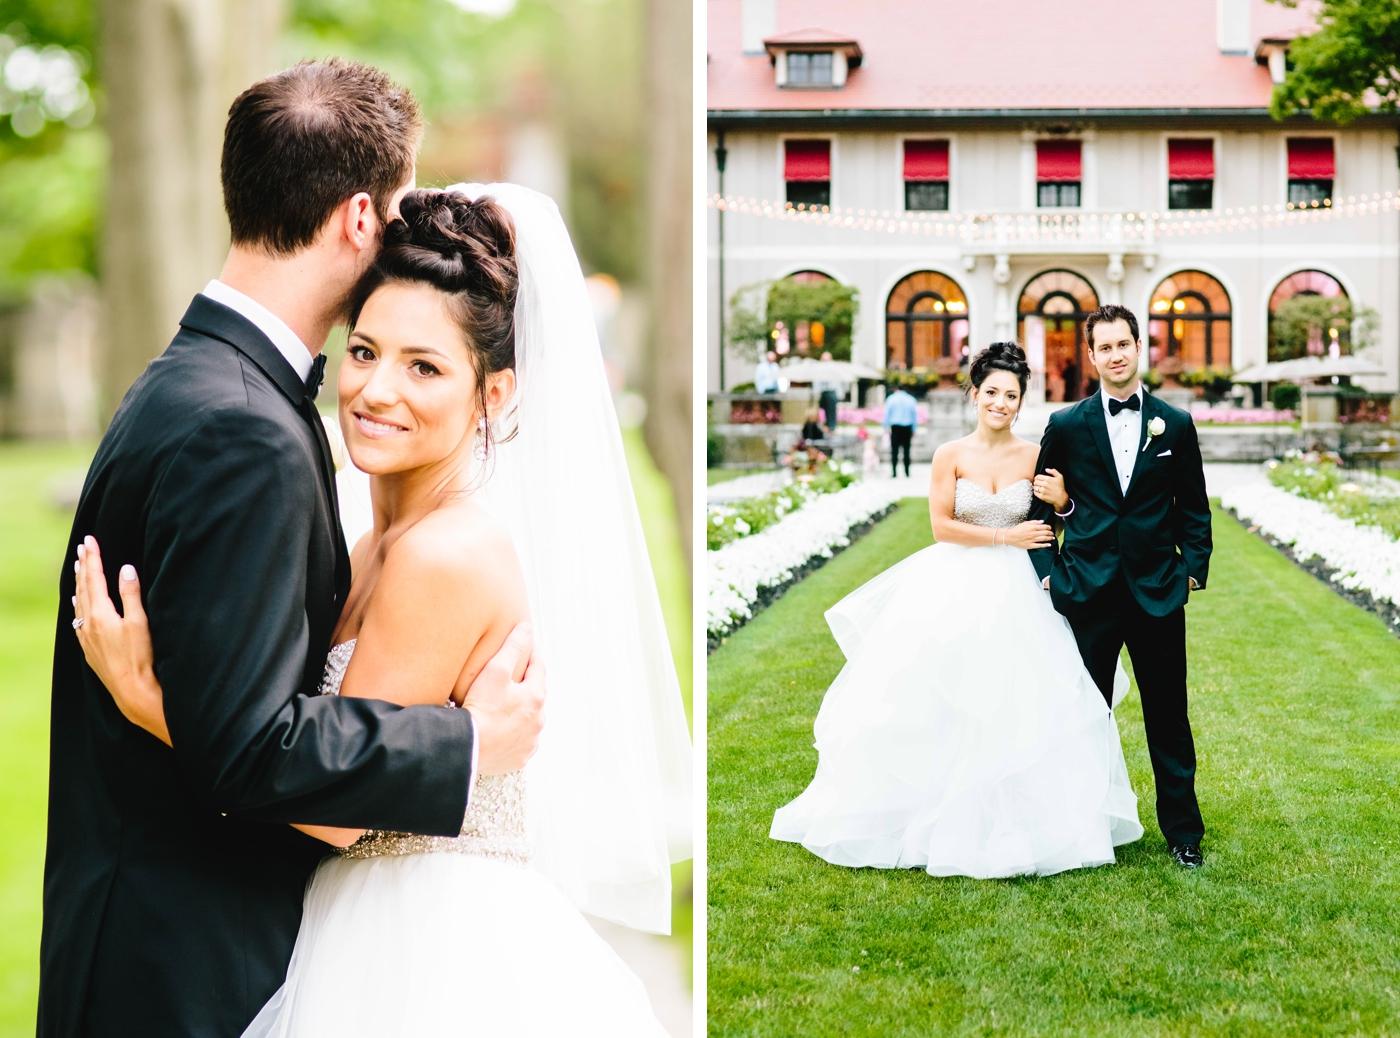 chicago-fine-art-wedding-photography-smeja44